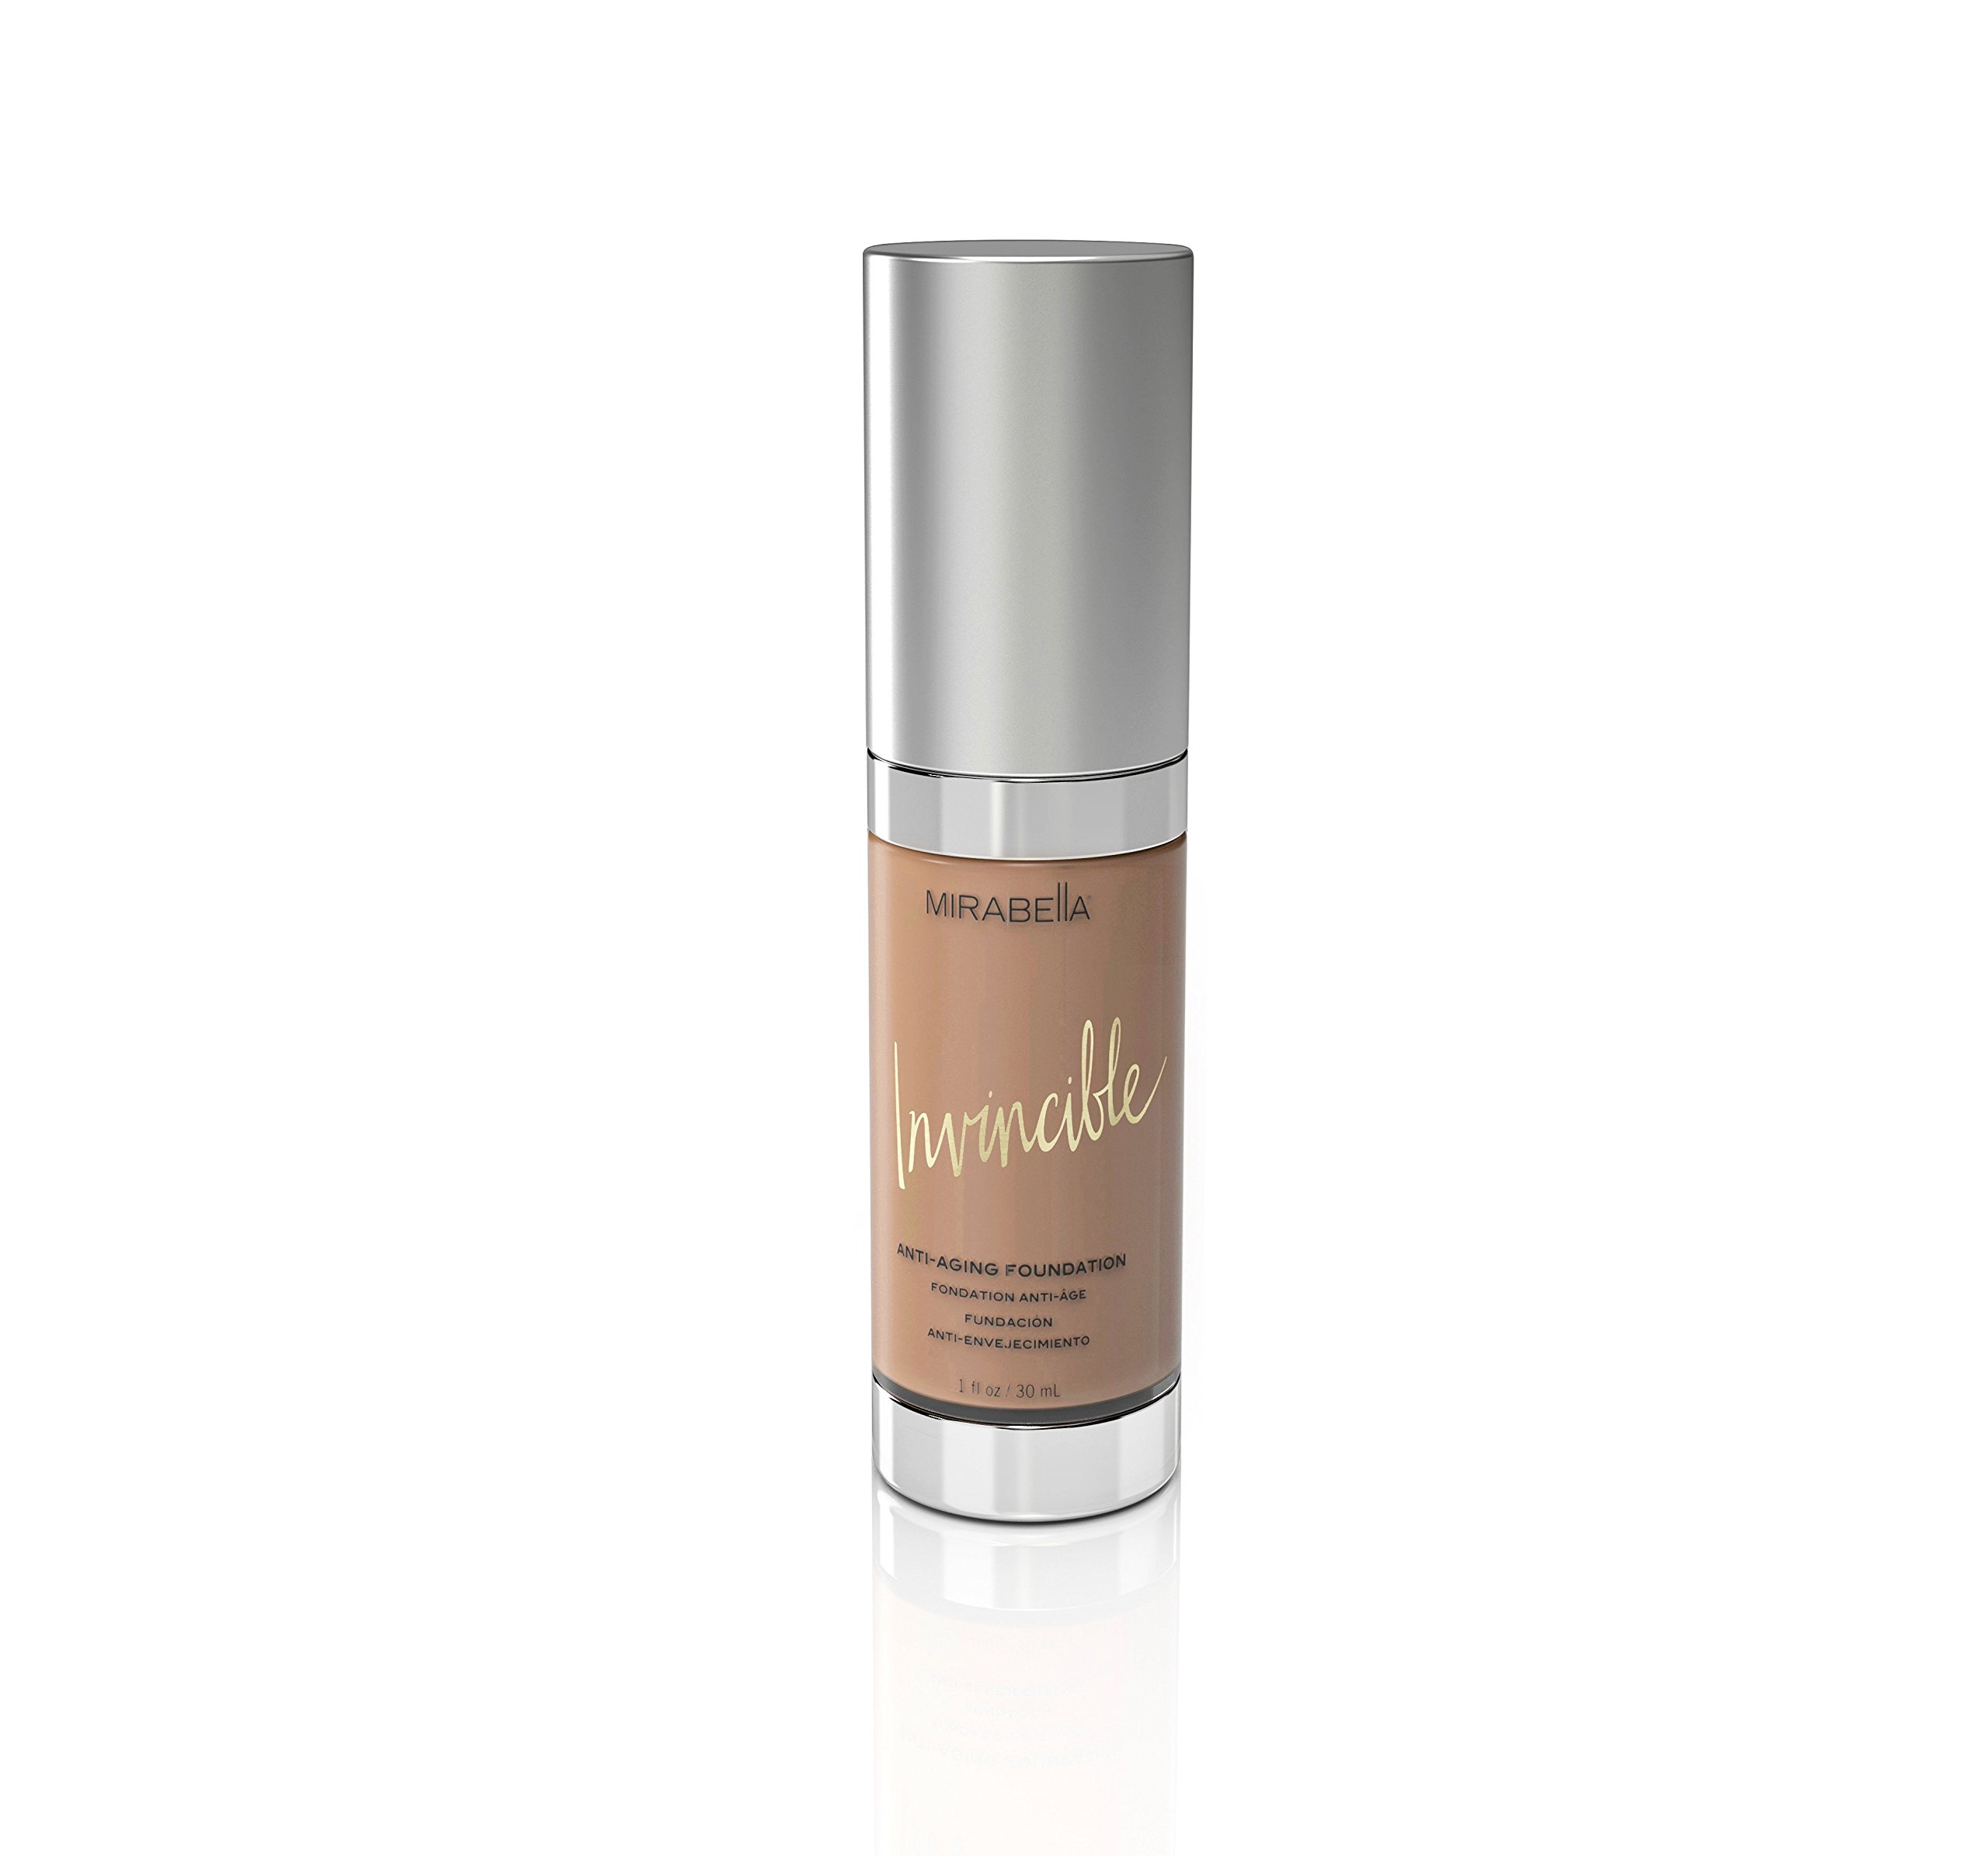 Mirabella Invincible Anti-Aging Full Coverage HD Liquid Foundation - Medium (IV), 1 fl.oz.